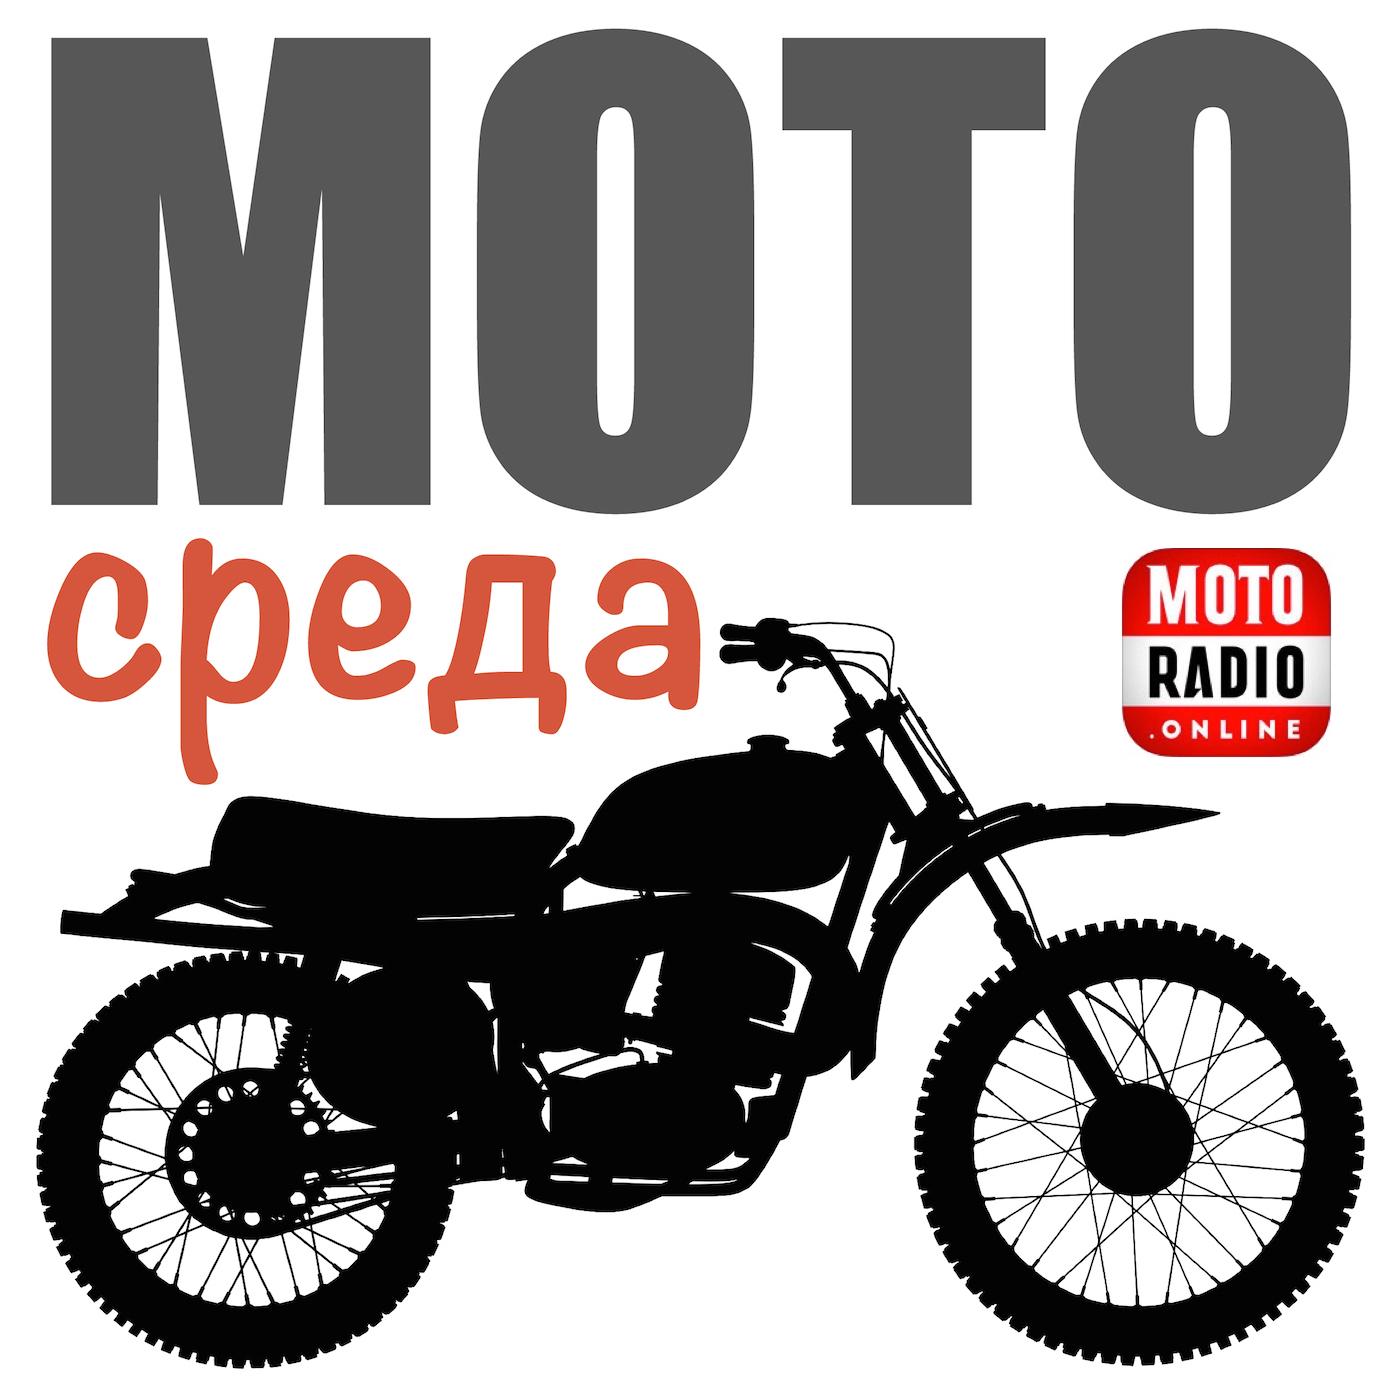 Олег Капкаев Yamaha R1 (YZF-R1). МОДЕЛЬНЫЙ РЯД. welly 12154p велли модель мотоцикла 1 18 motorcycle yamaha 2001 yzf1000r thunderace